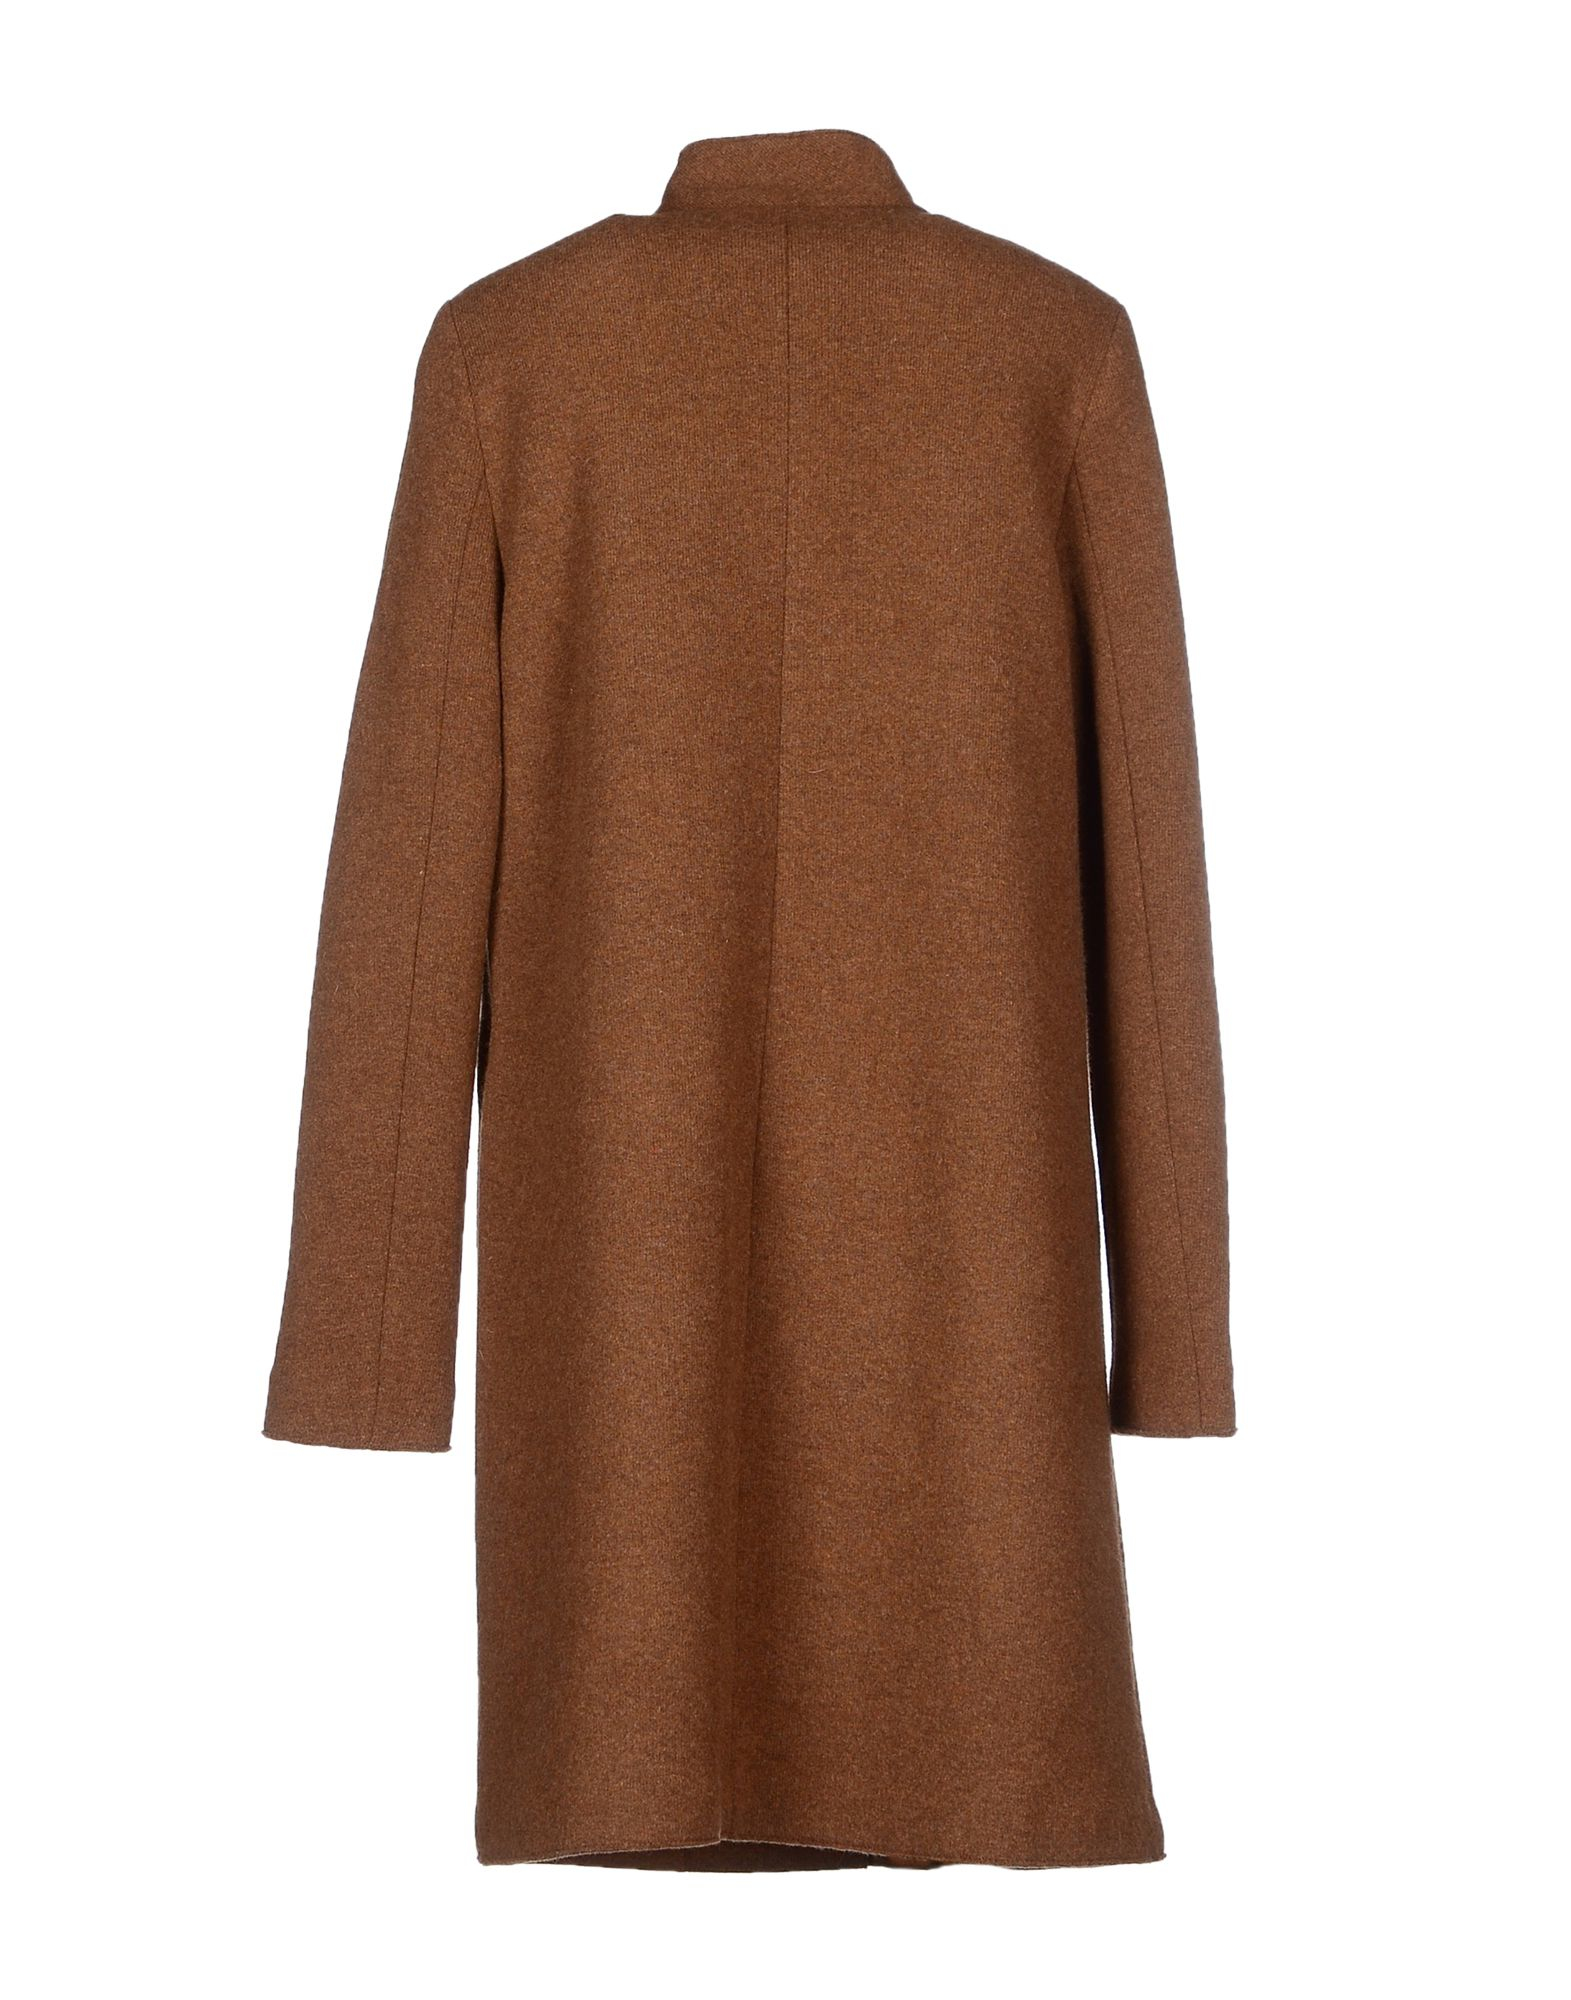 Barena Coat in Brown